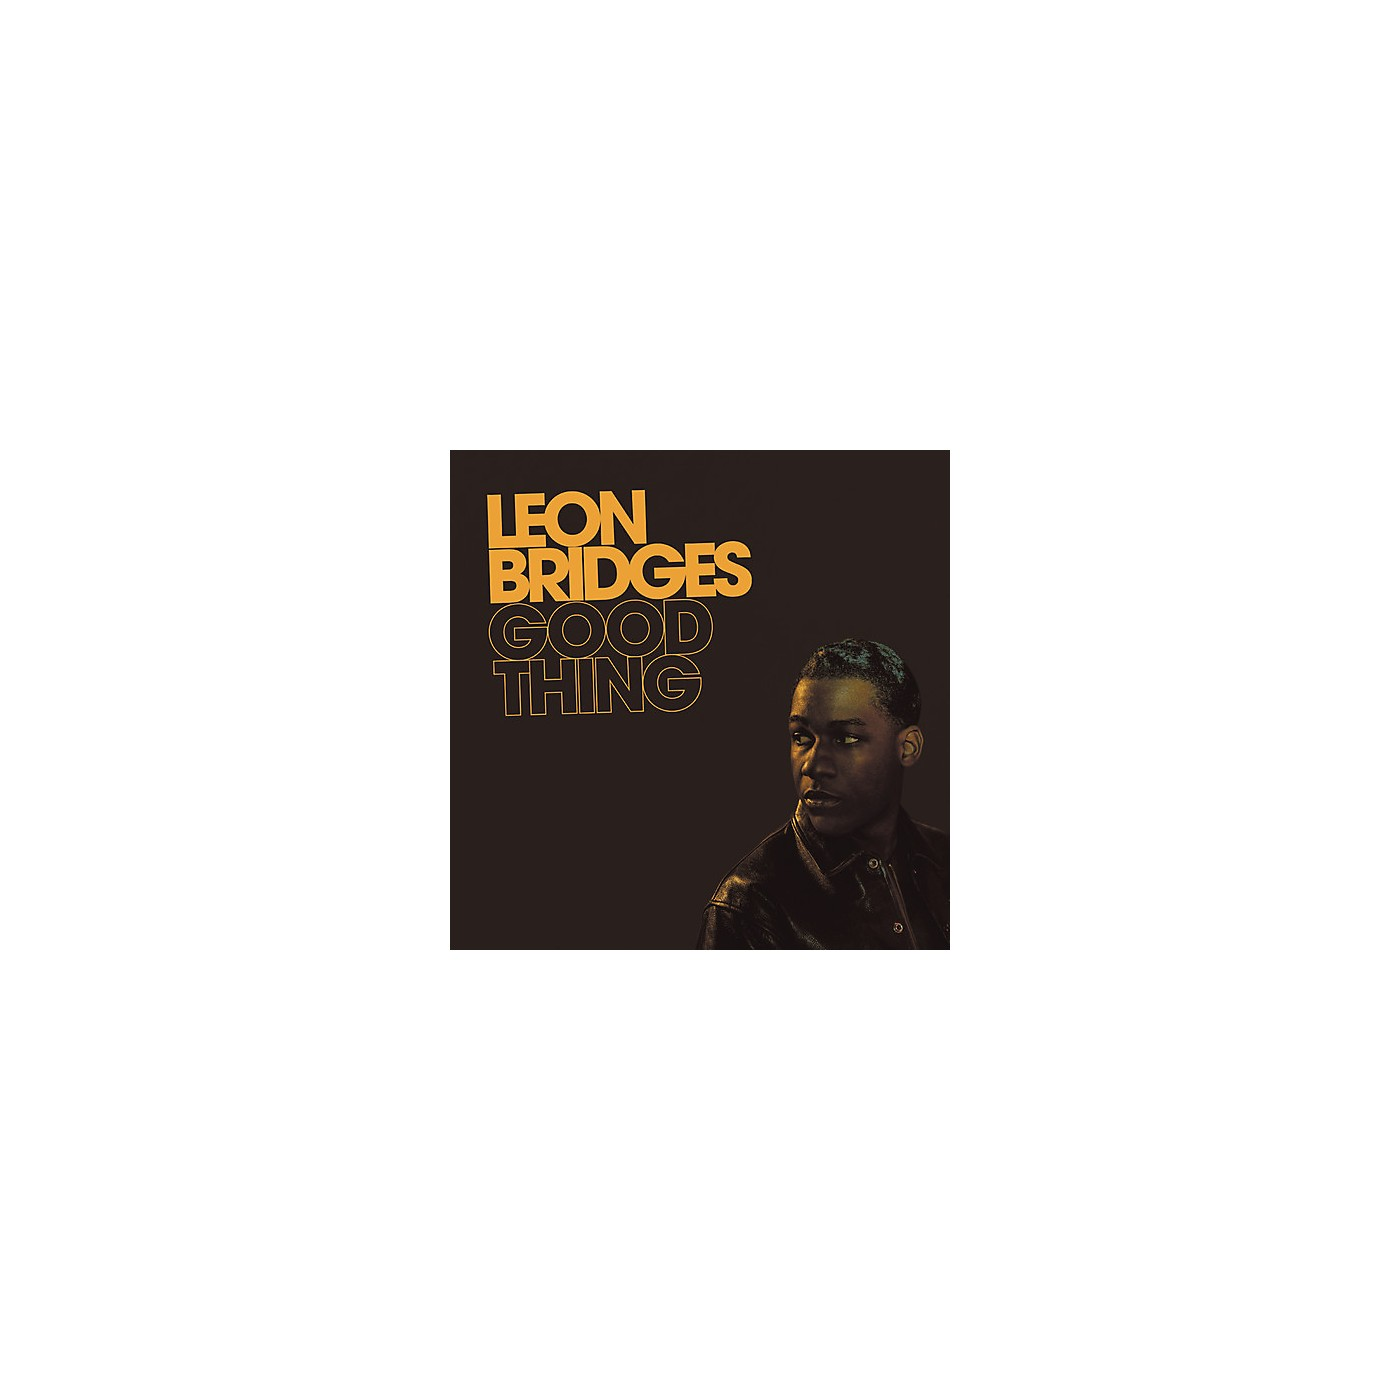 Alliance Leon Bridges - Good Thing (CD) thumbnail